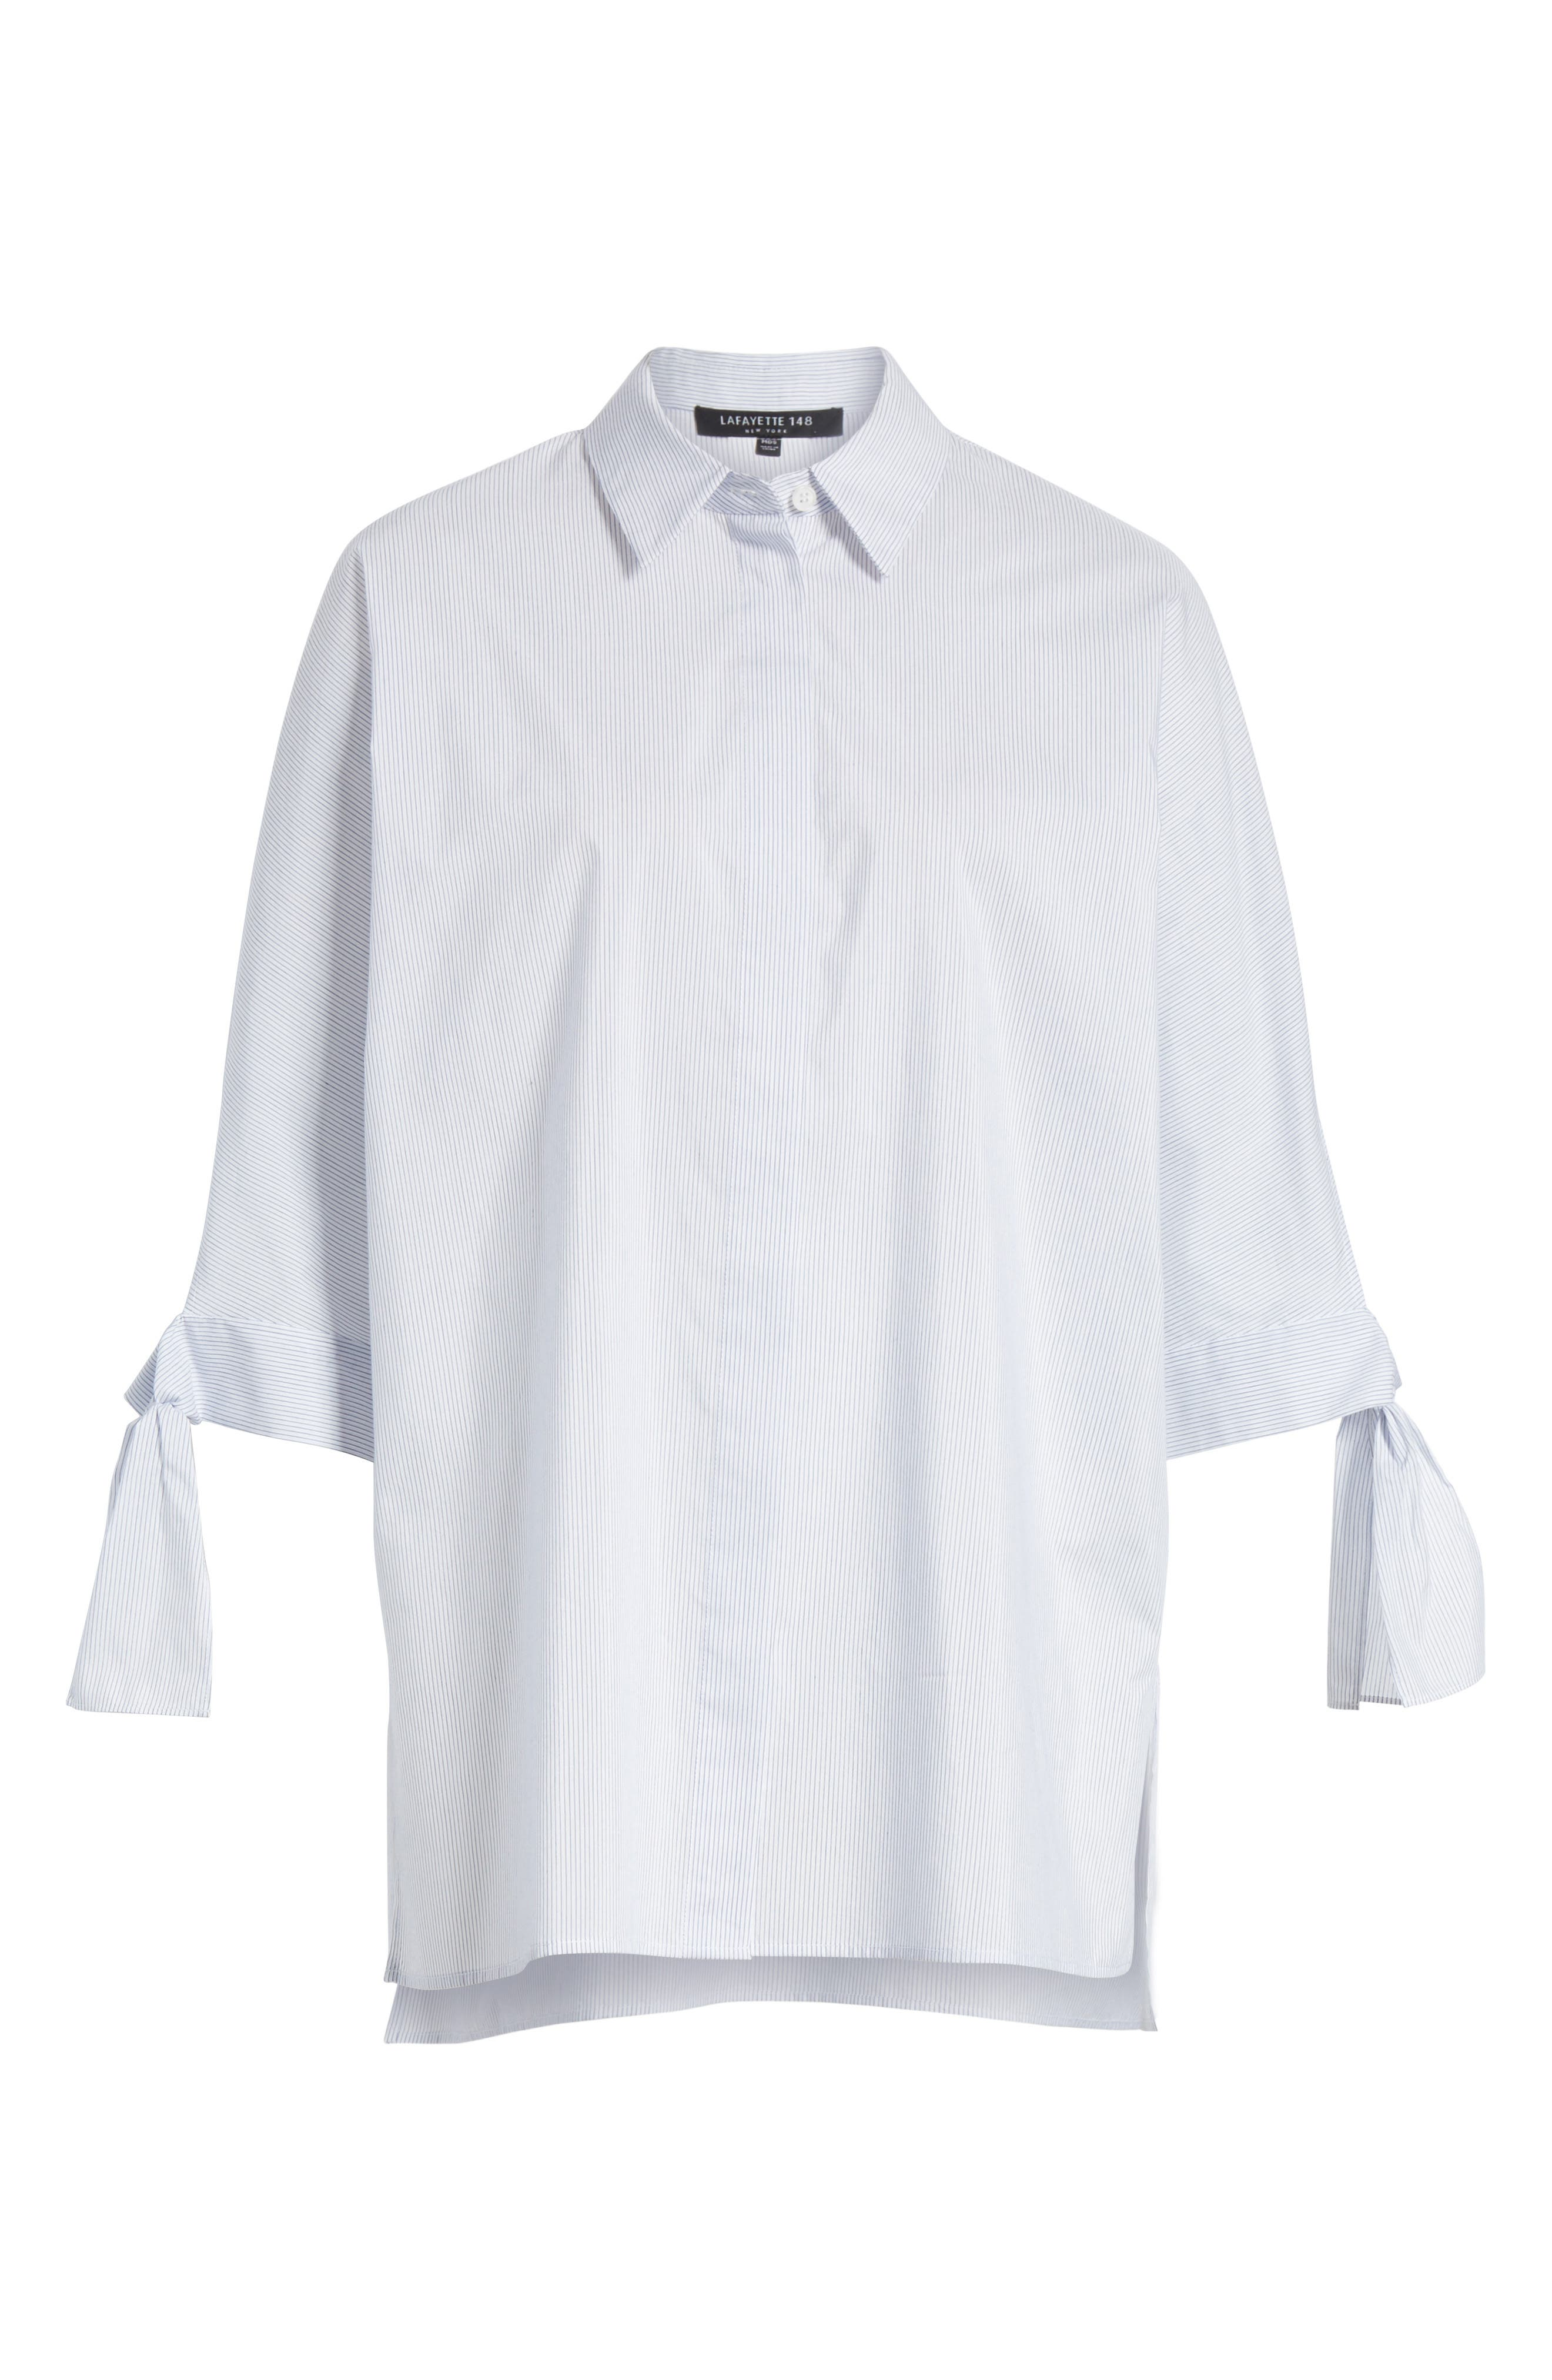 Breezy Stripe Saige Blouse,                             Alternate thumbnail 7, color,                             White Multi